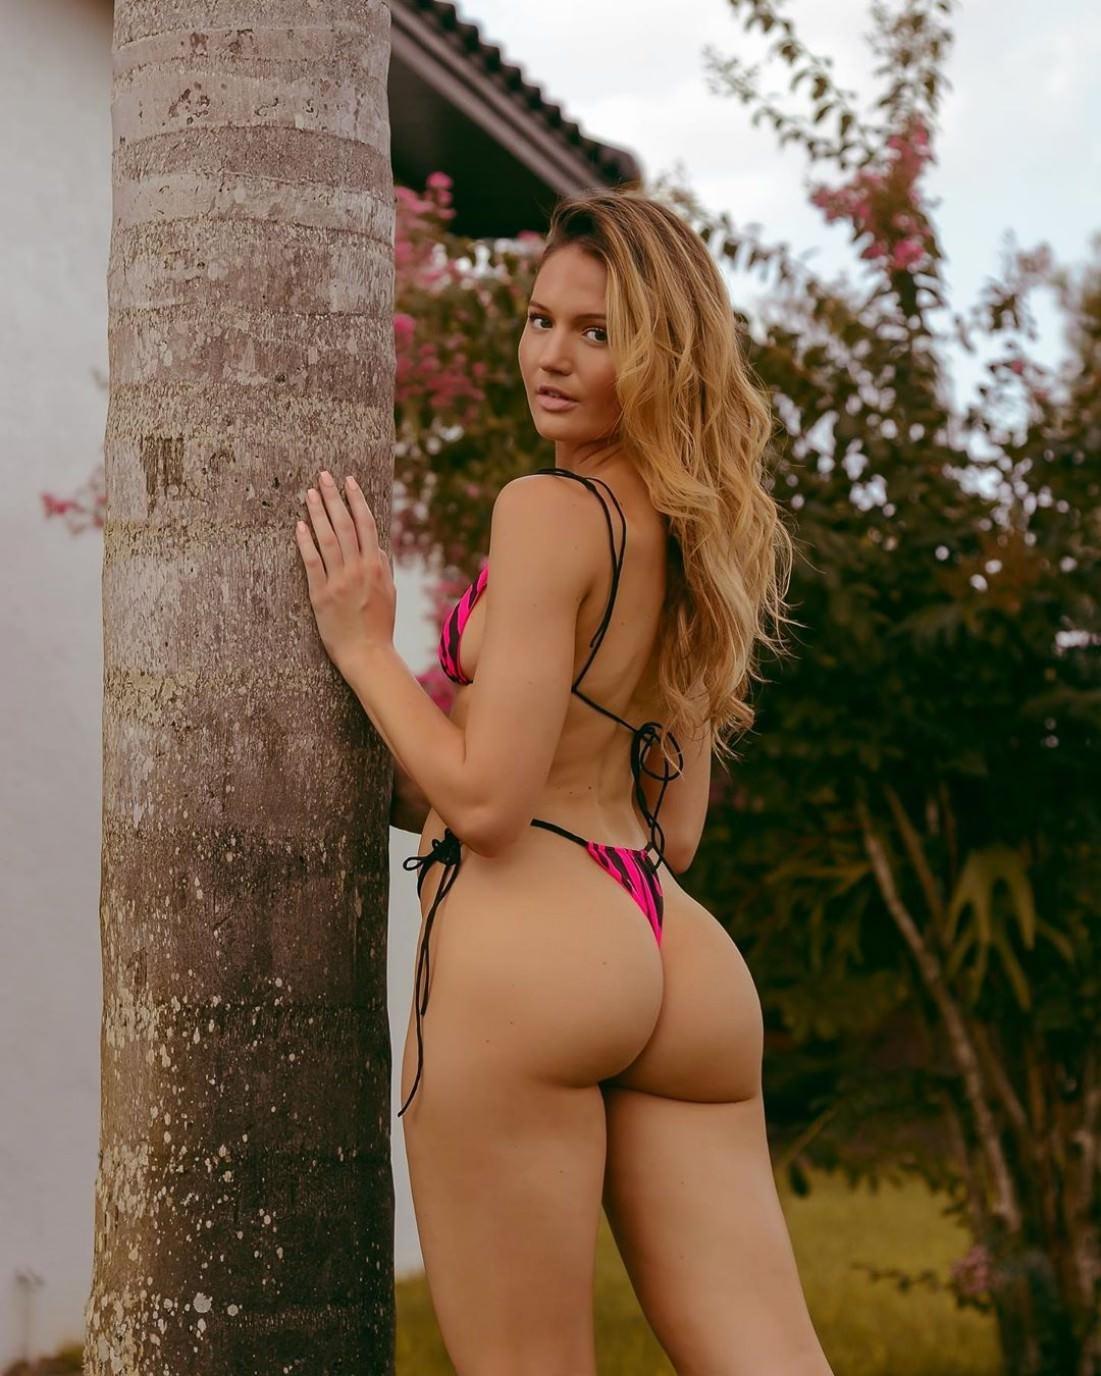 Summer Lynn Hart Goes Braless In Unbuttoned Top In Flirty New Snap